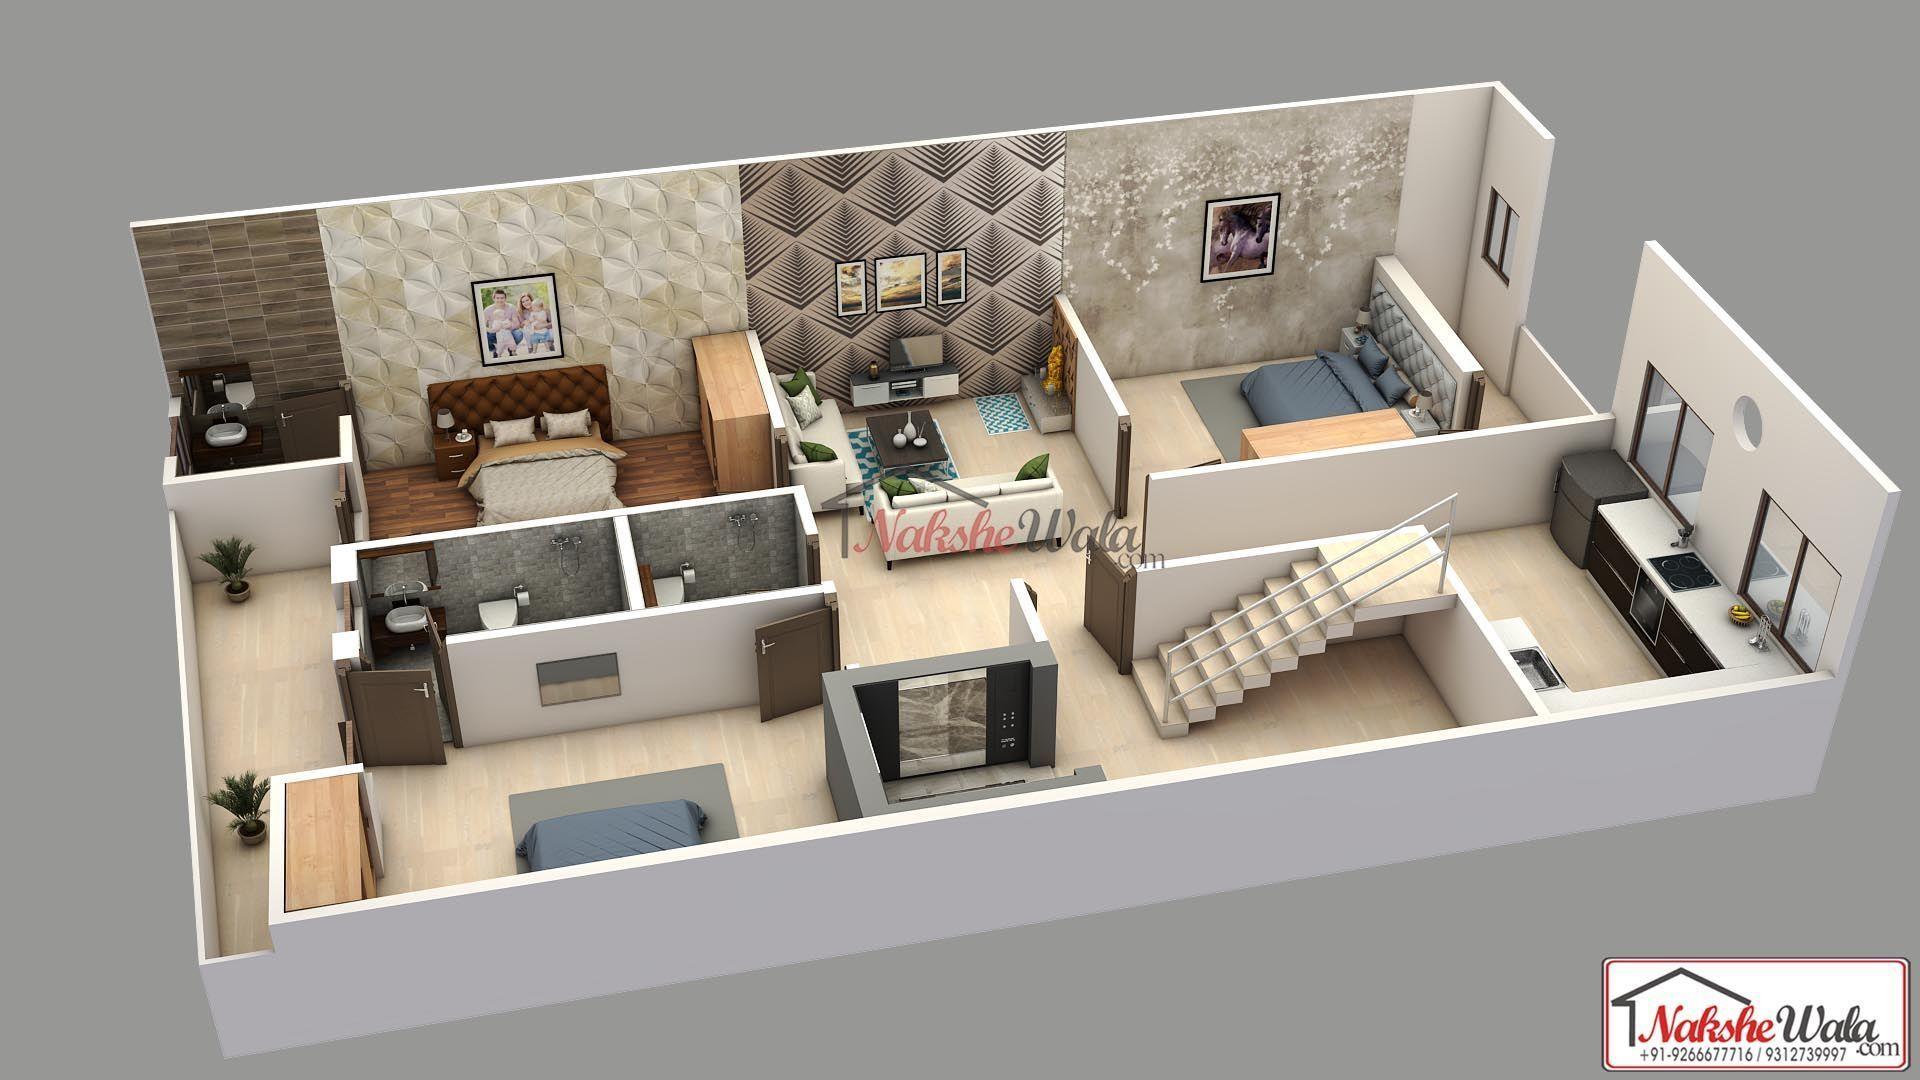 2bhk 3d Grundriss 3d Grundriss 2bhk Floor Grundriss Plan Favoriten 3d Grundrisse 2bhk 3d Grun In 2020 House Plans Model House Plan Floor Plan Design